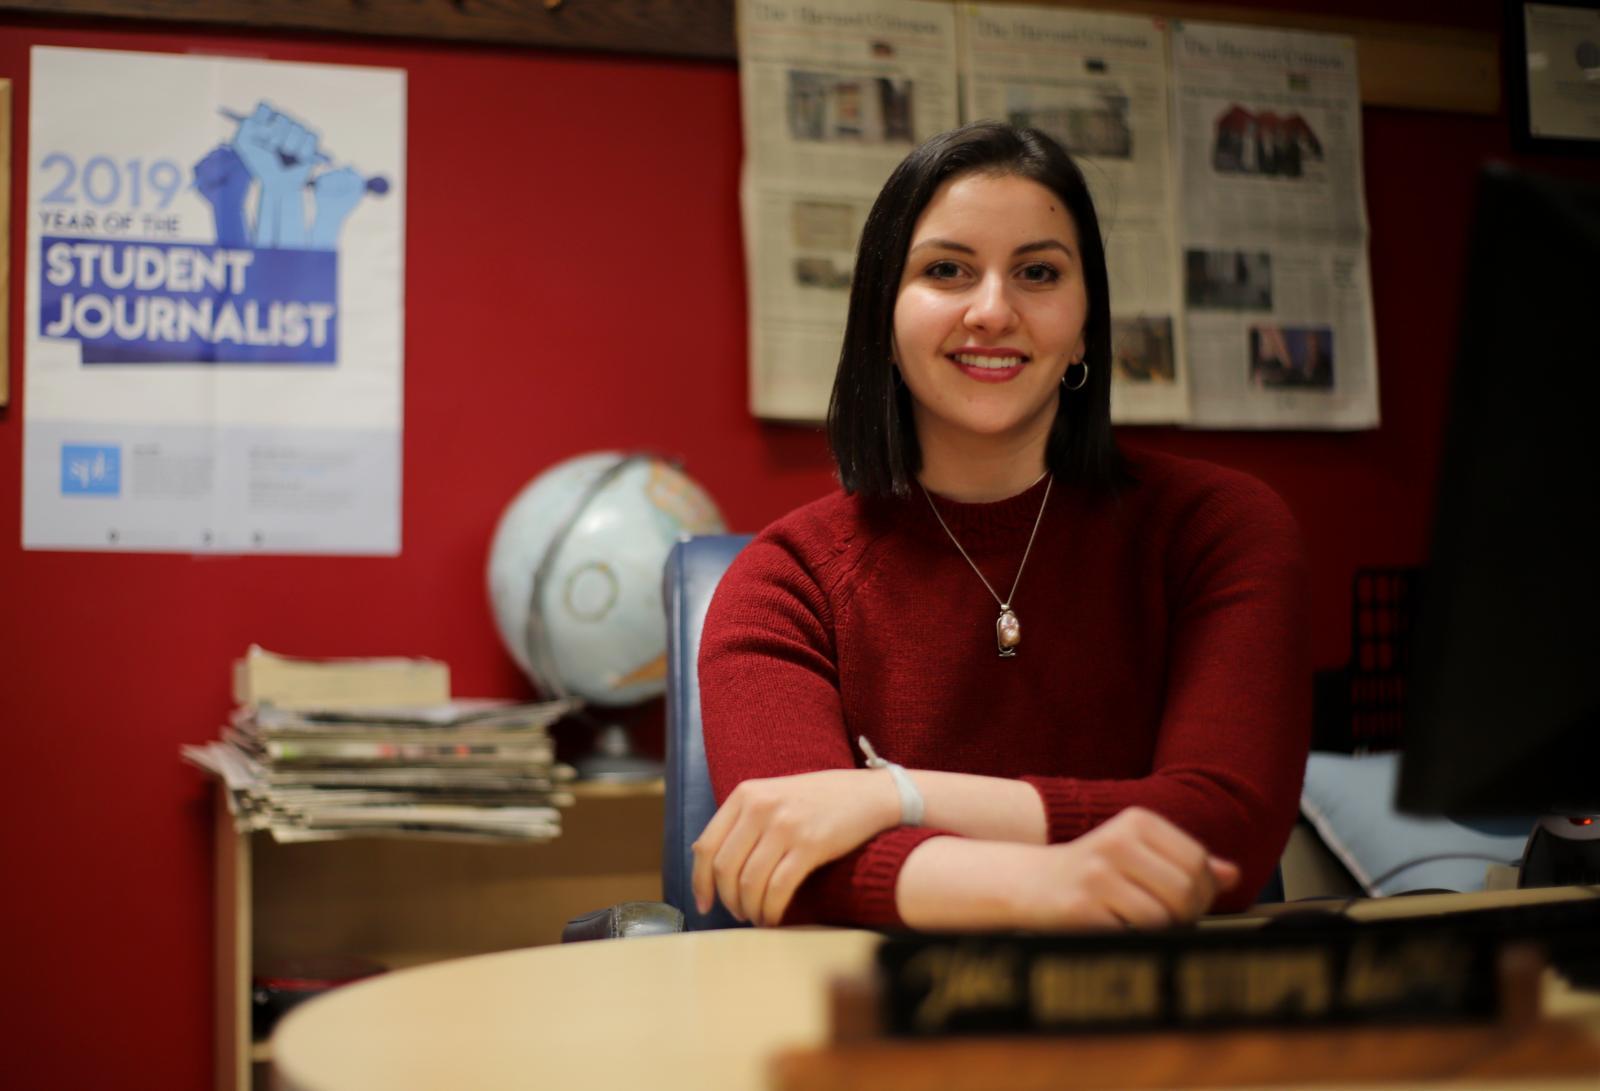 Shera S. Avi-Yonah for the Harvard Crimson